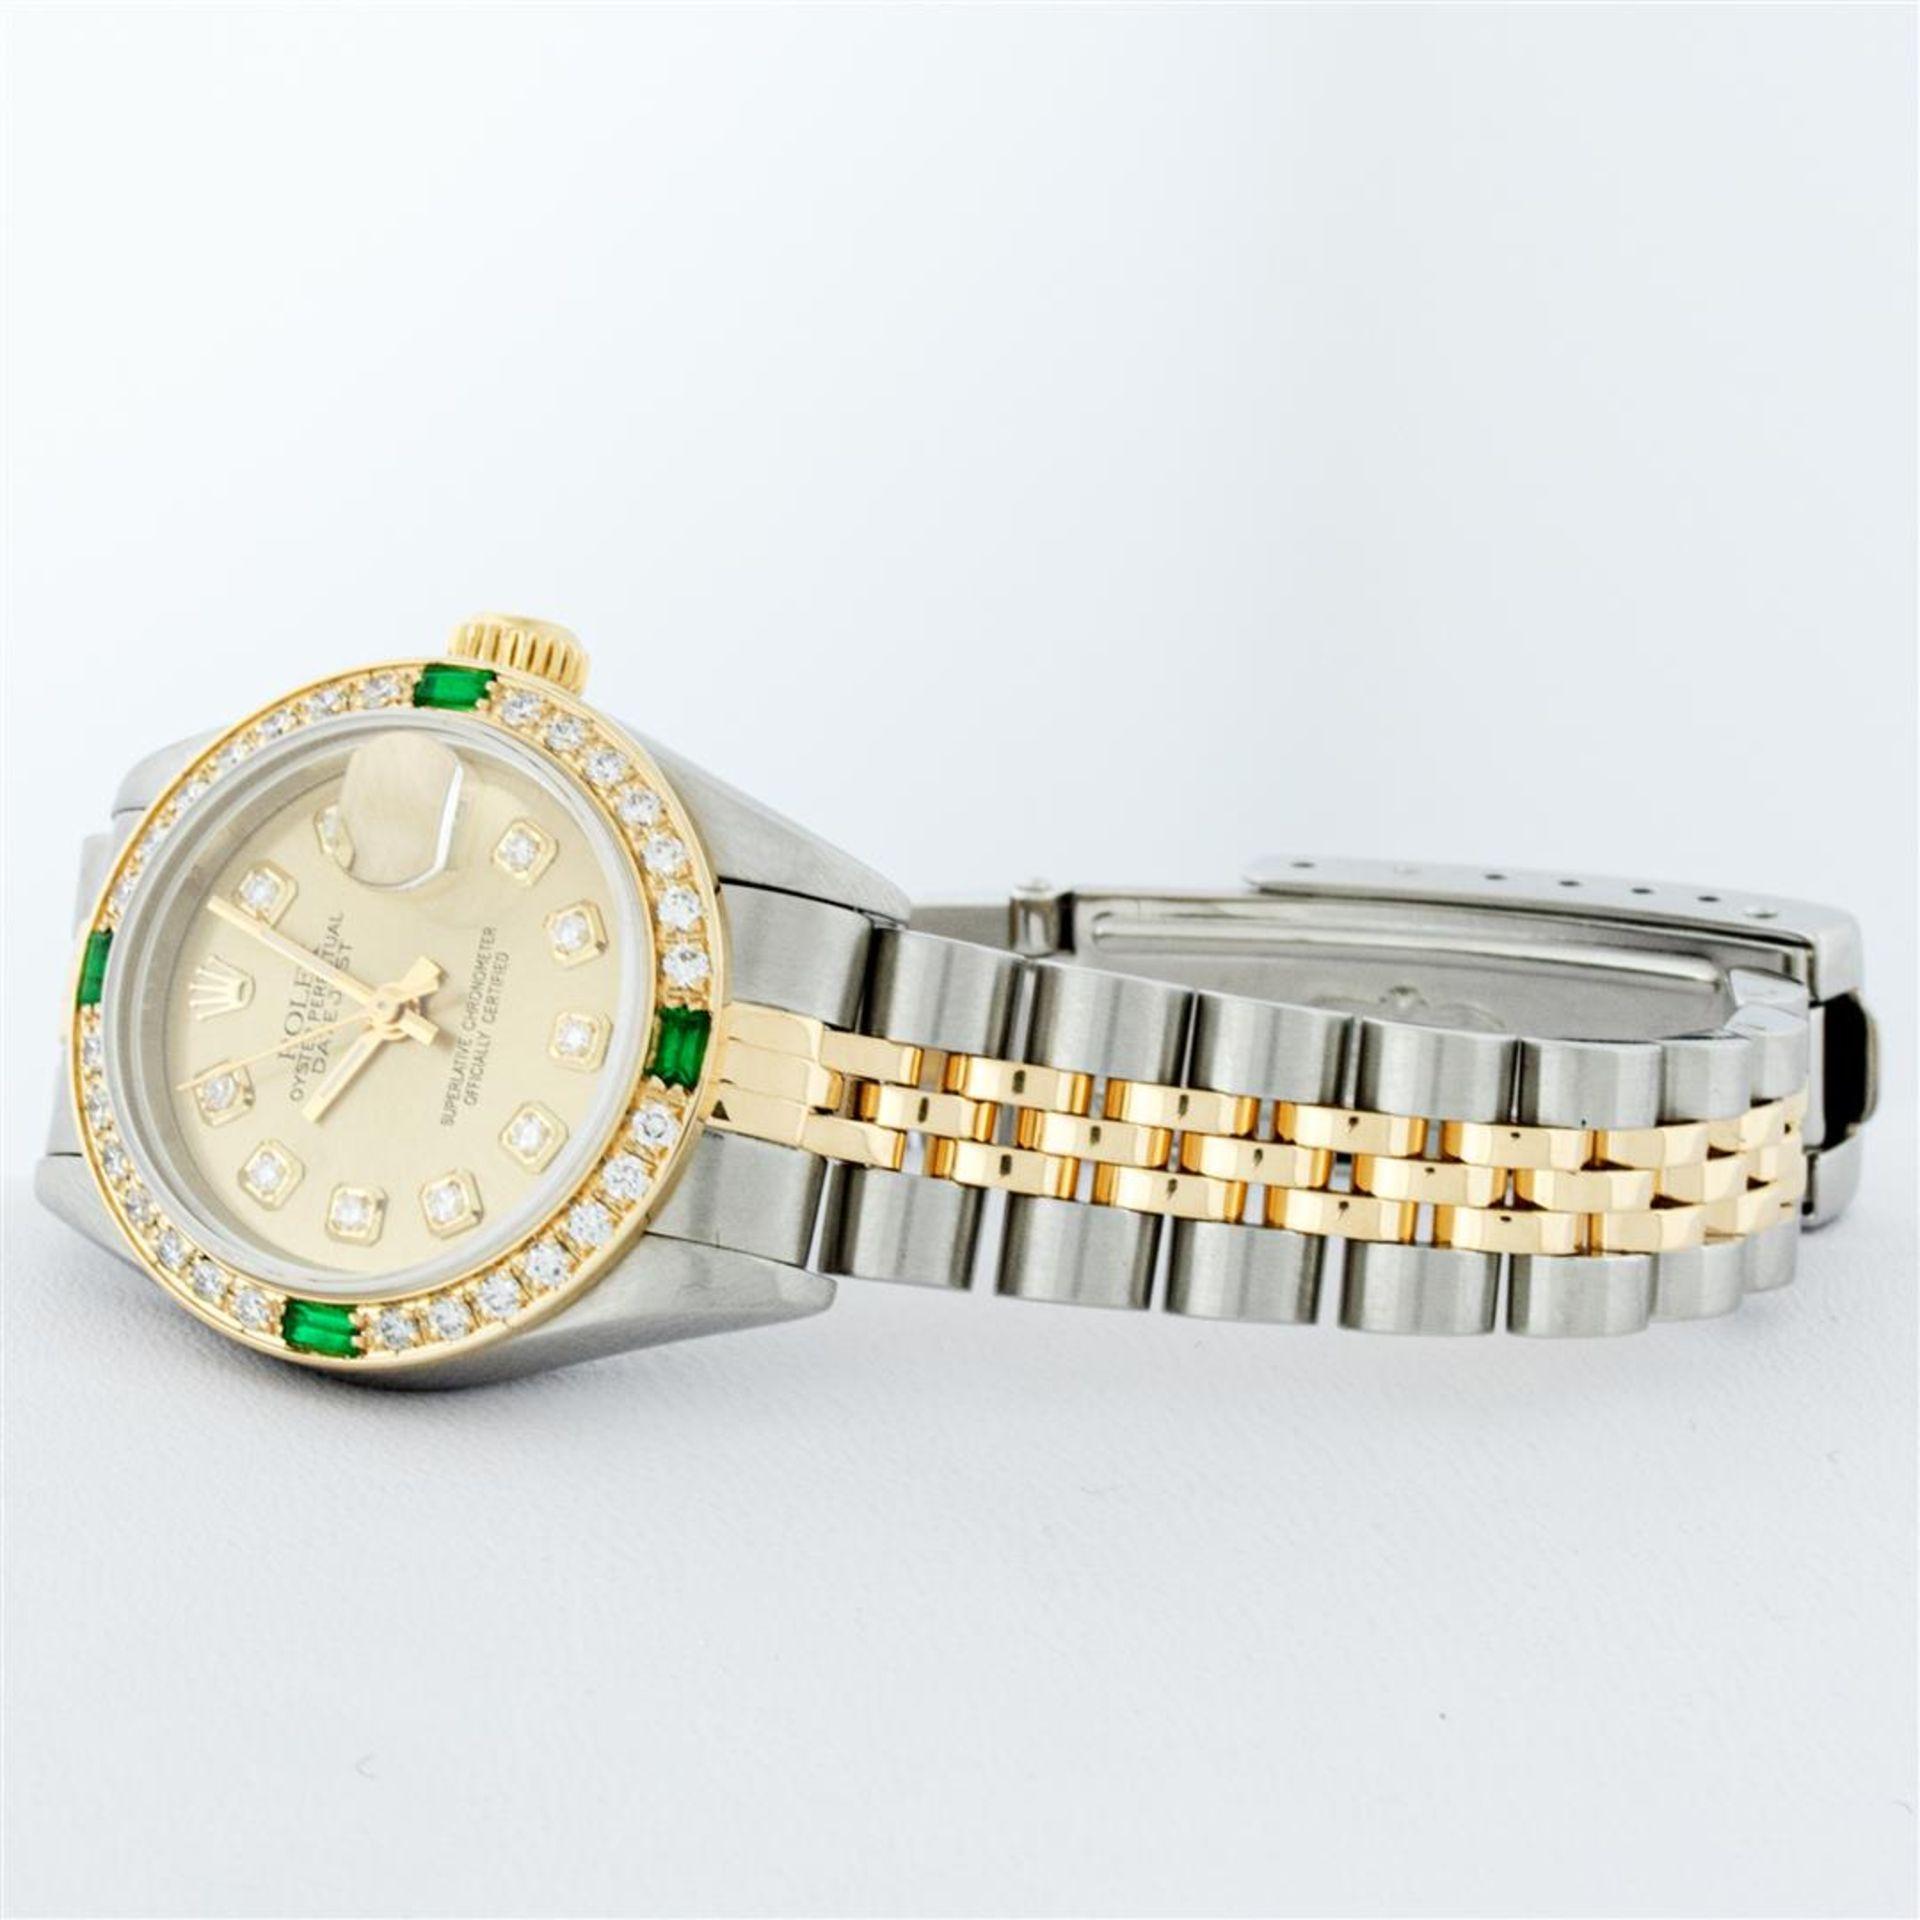 Rolex Ladies 2 Tone 18K Quickset Champagne Diamond & Emerald Datejust Wristwatch - Image 5 of 9